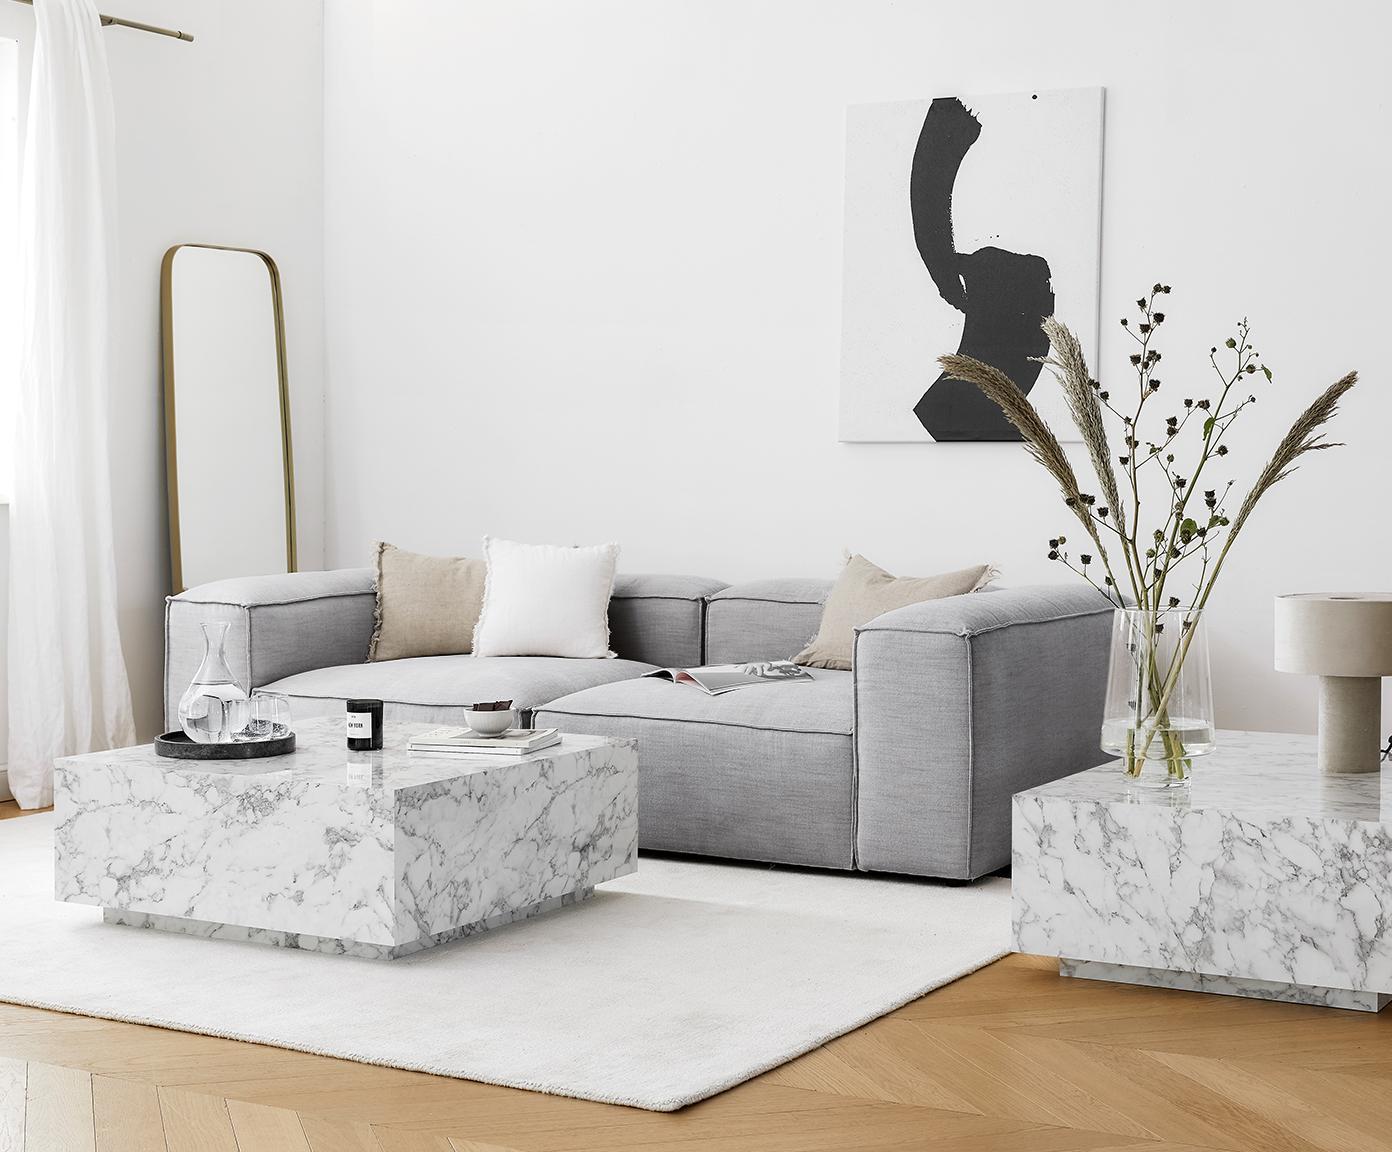 Modulares Sofa Lennon (3-Sitzer), Bezug: Polyester 35.000 Scheuert, Gestell: Massives Kiefernholz, Spe, Webstoff Hellgrau, B 238 x T 119 cm